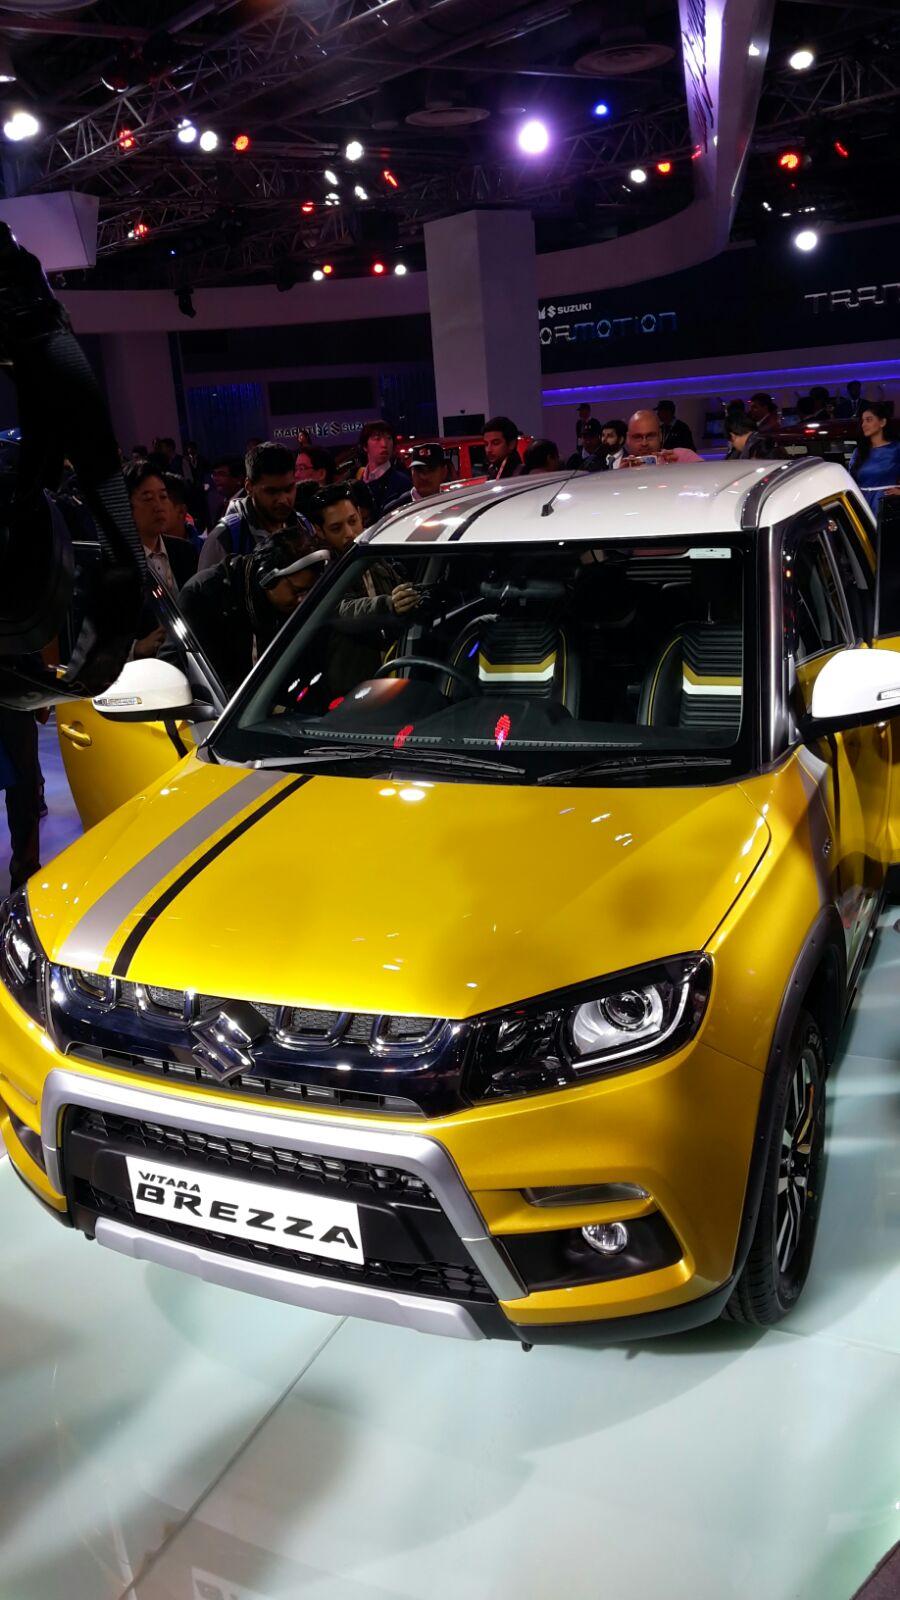 Maruti Vitara Breeza Auto Expo 20169 Carblogindia